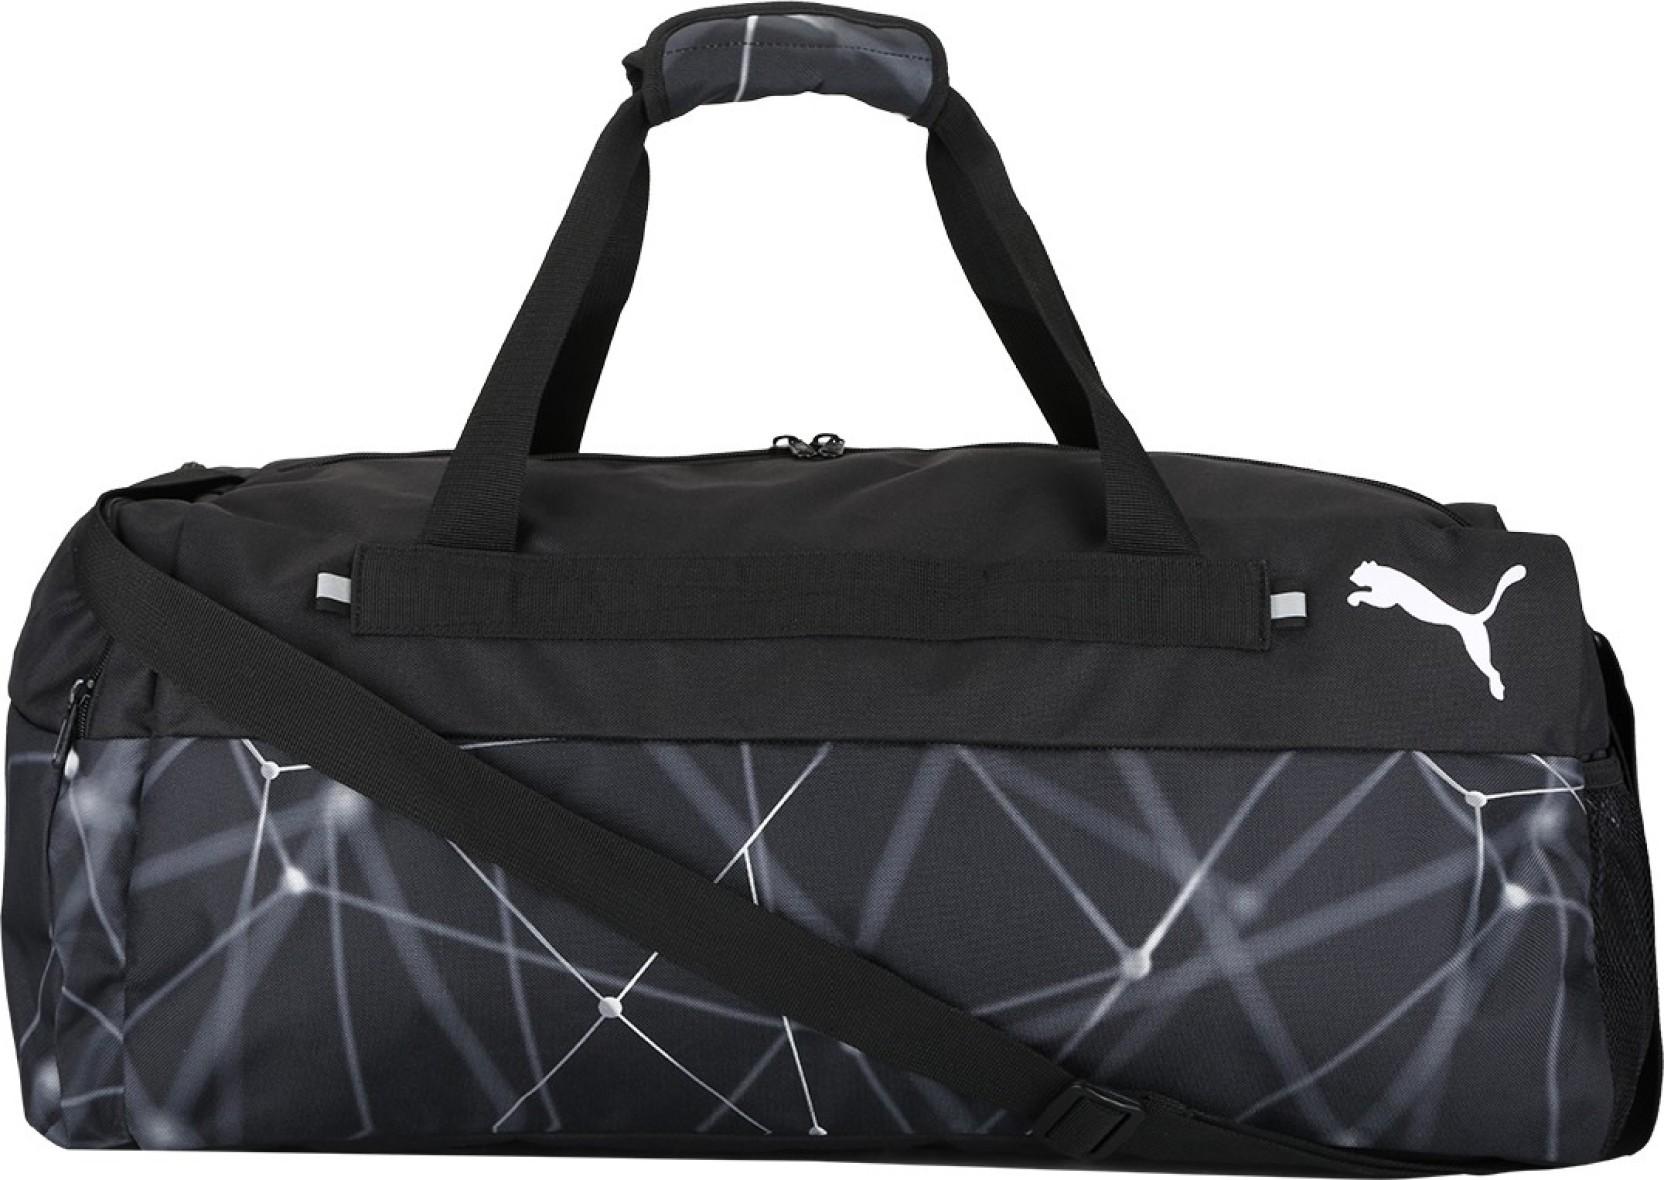 90c3799b45c1 Puma fundamentals sports bag graphic bag puma black galaxy jpg 1664x1180 Workout  bags puma small